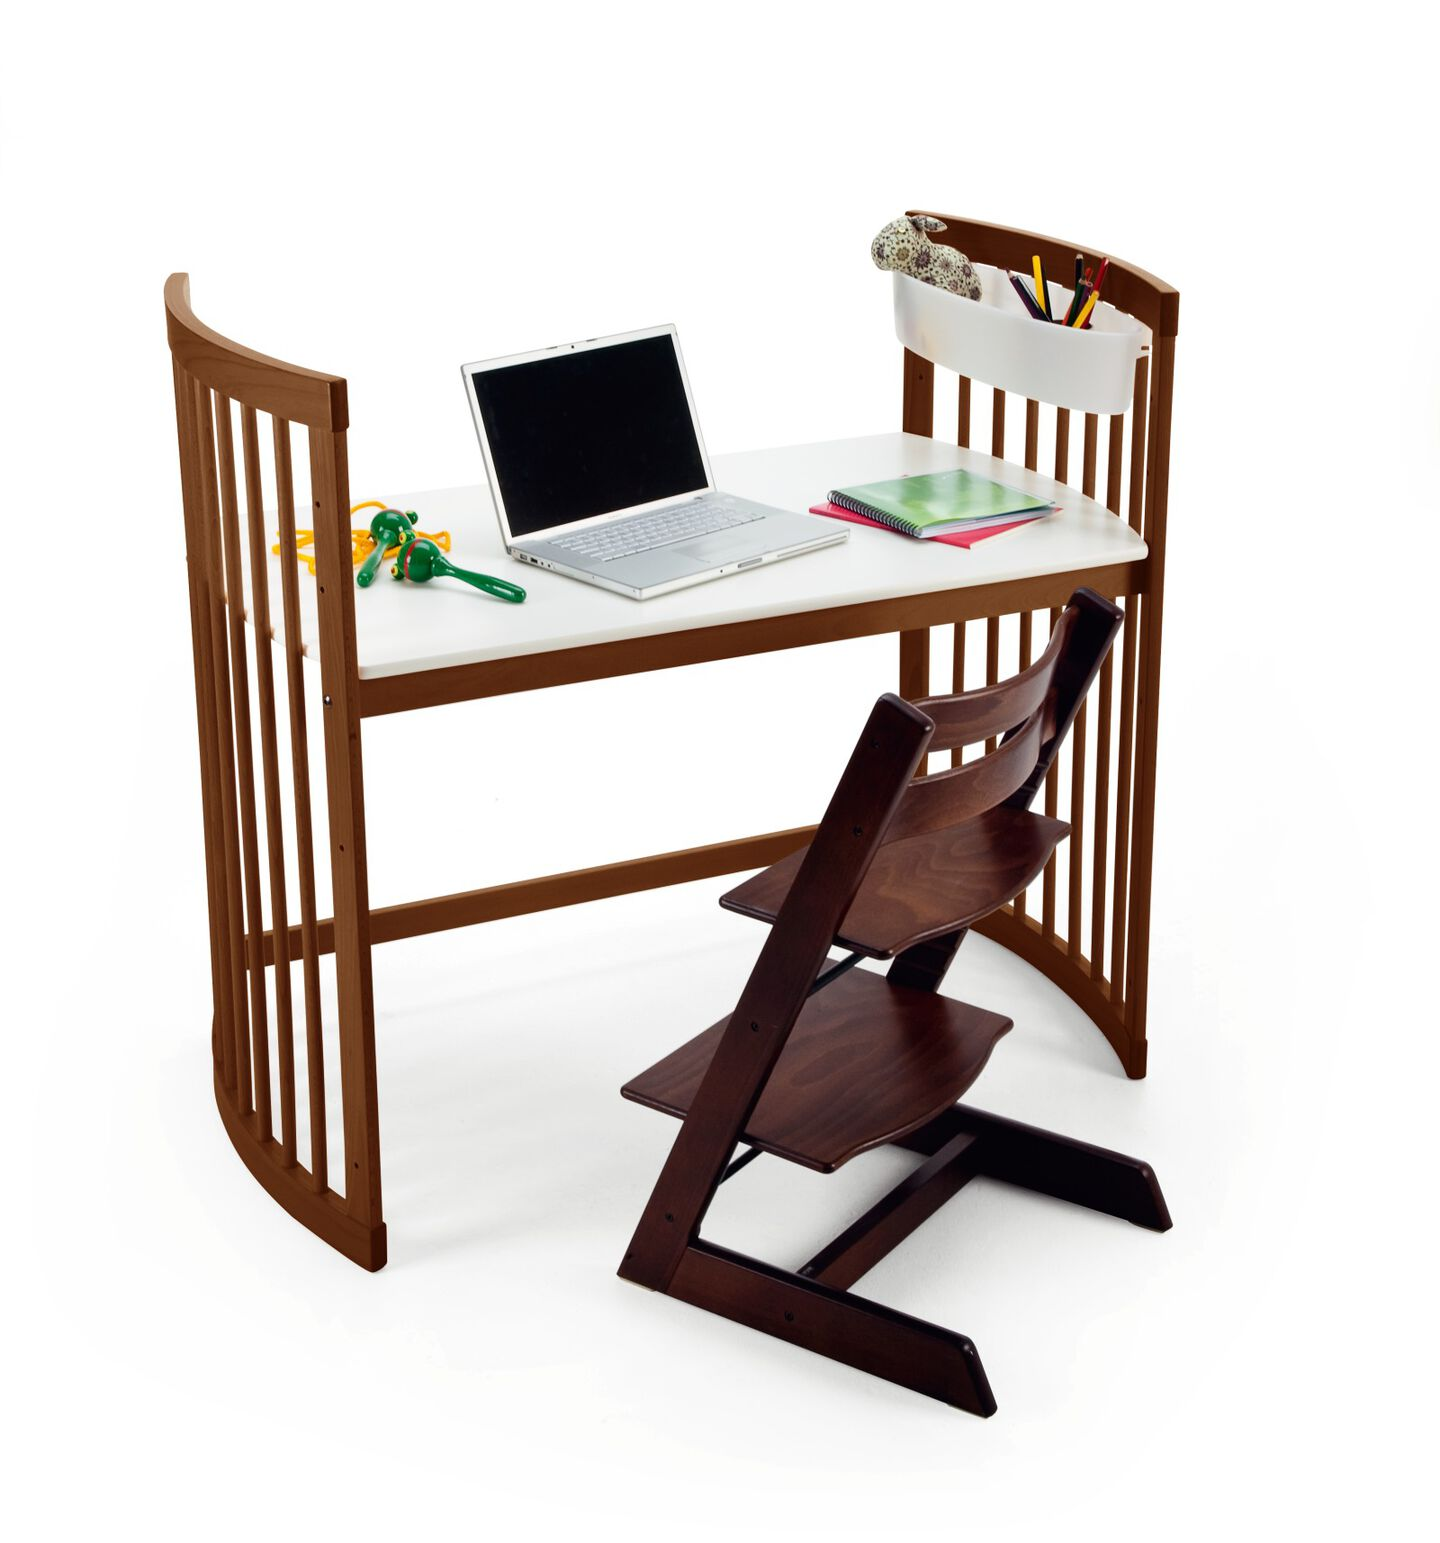 Stokke® Care large desk Walnut Brown, with Tripp Trapp® Walnut Brown.